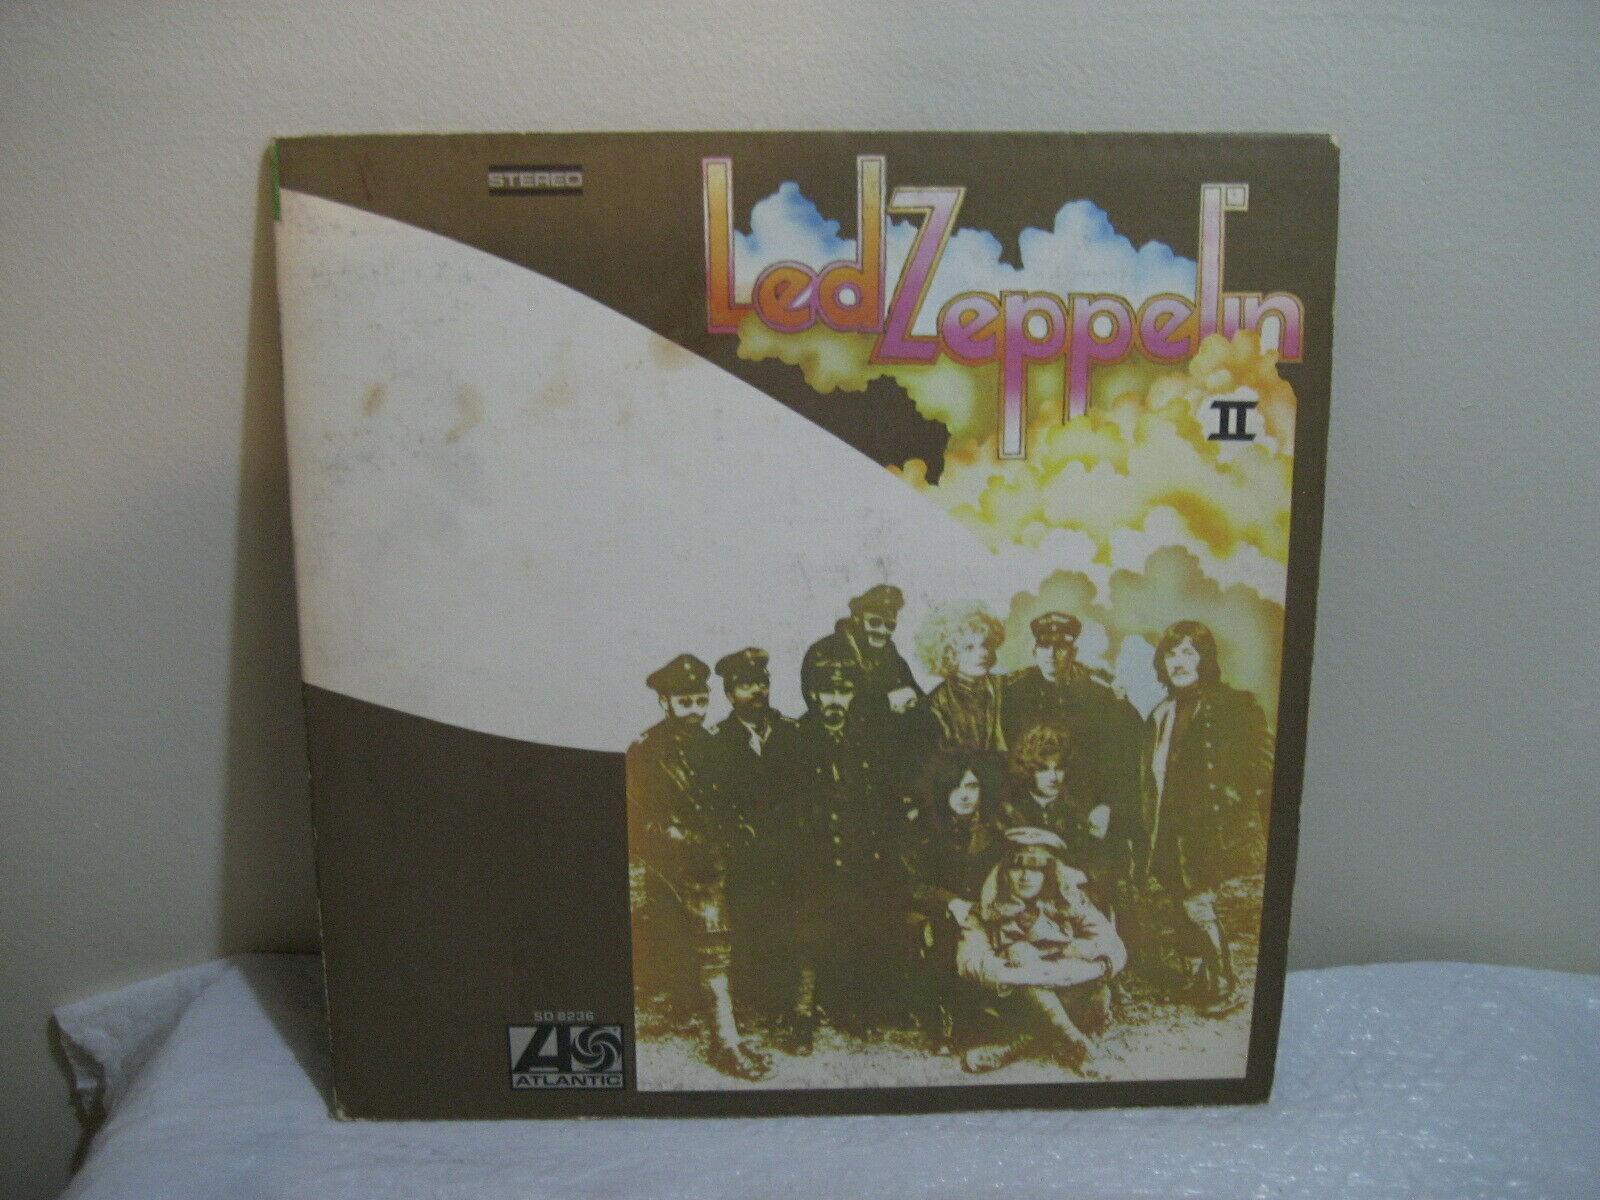 LED ZEPPELIN 11 33 rpm lp record 1969